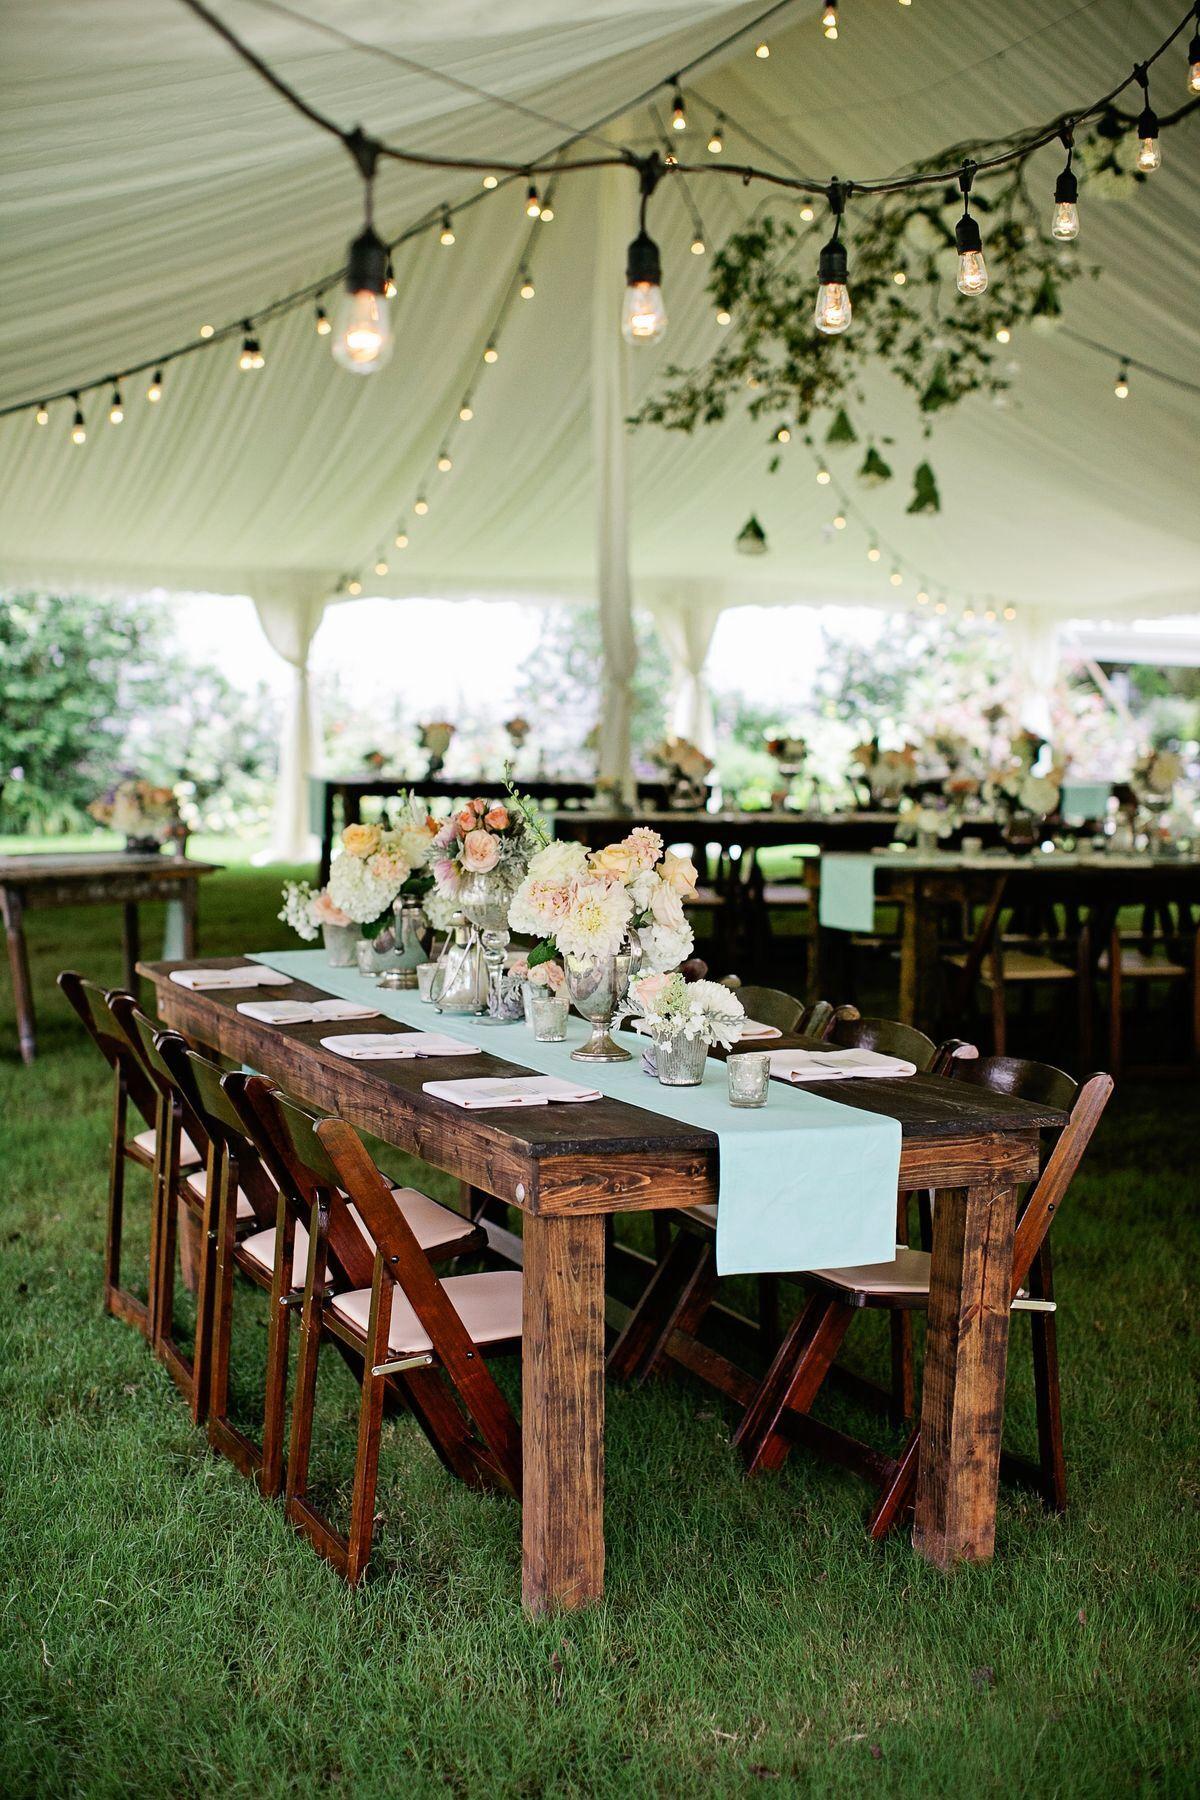 Wedding decoration ideas garden party  Garden Wedding  Wedding of my dreams  Pinterest  Wedding bells